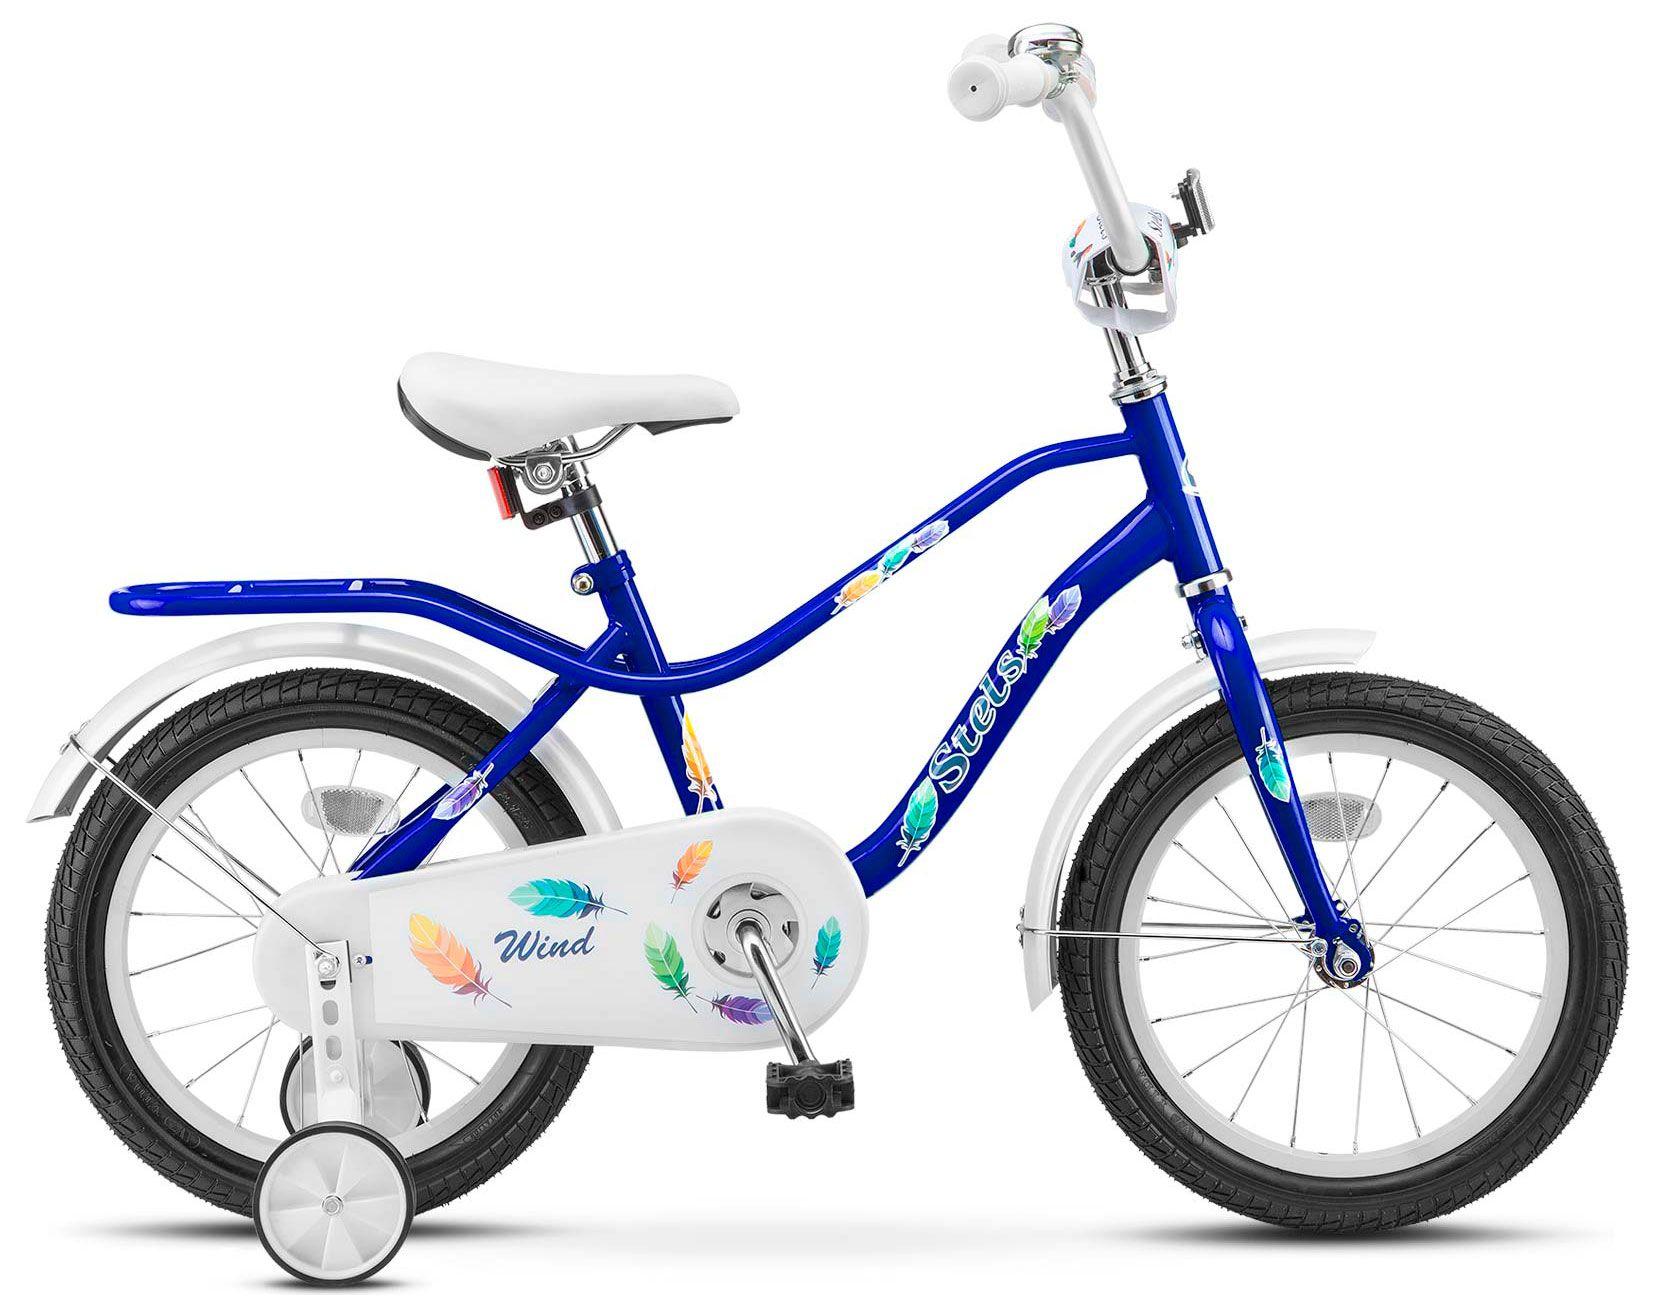 Велосипед Stels Wind 16 (Z010) 2018,  Детские  - артикул:292911